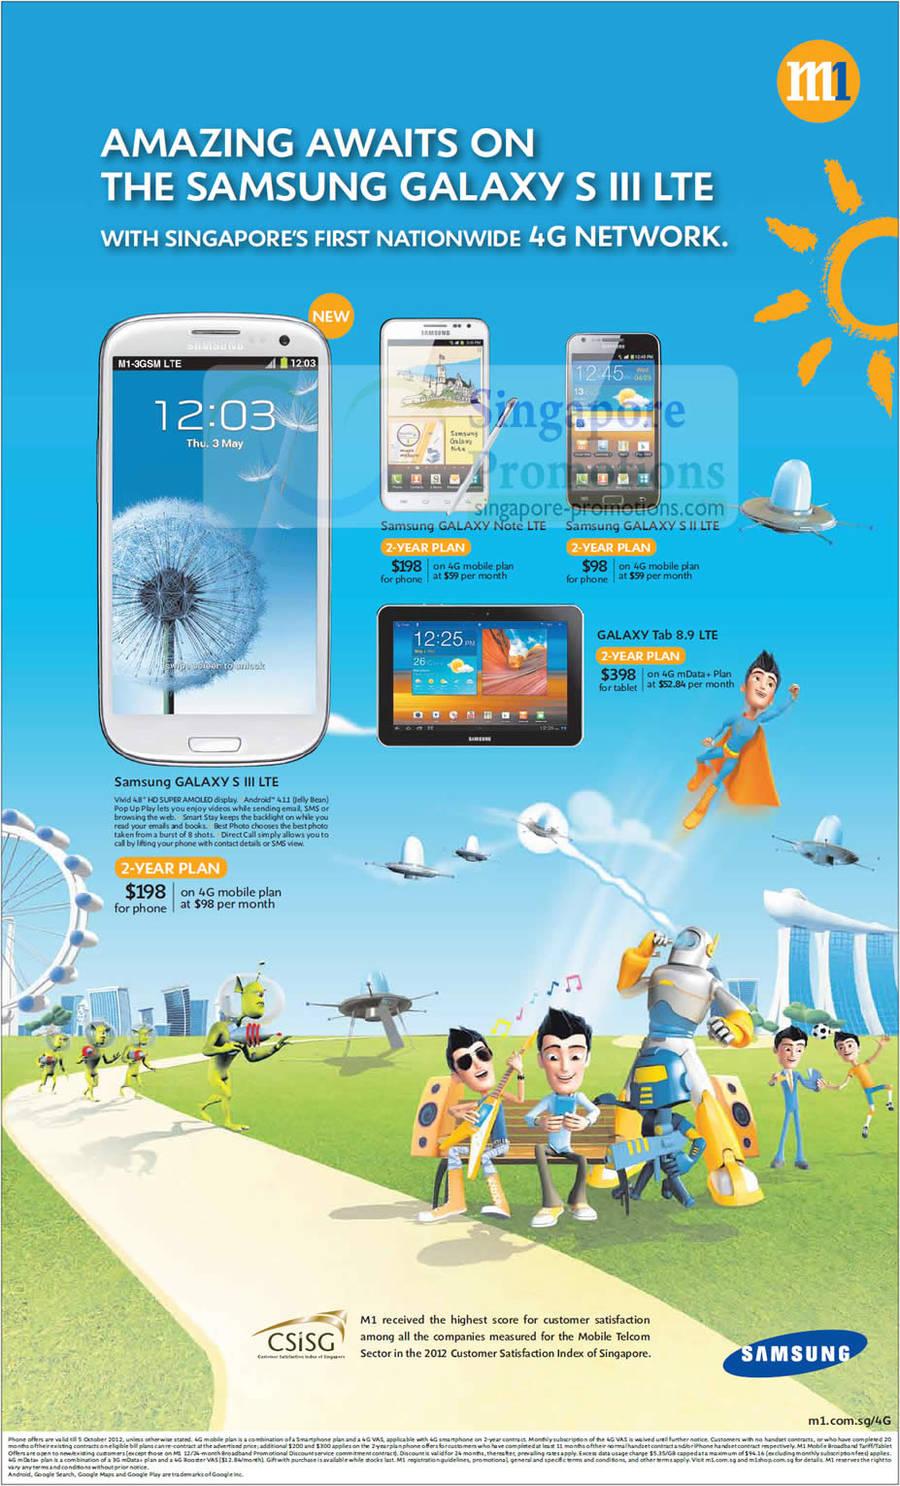 Samsung Galaxy S III LTE, Samsung Galaxy Note LTE, Samsung Galaxy S II LTE, Samsung Galaxy Tab 8.9 LTE